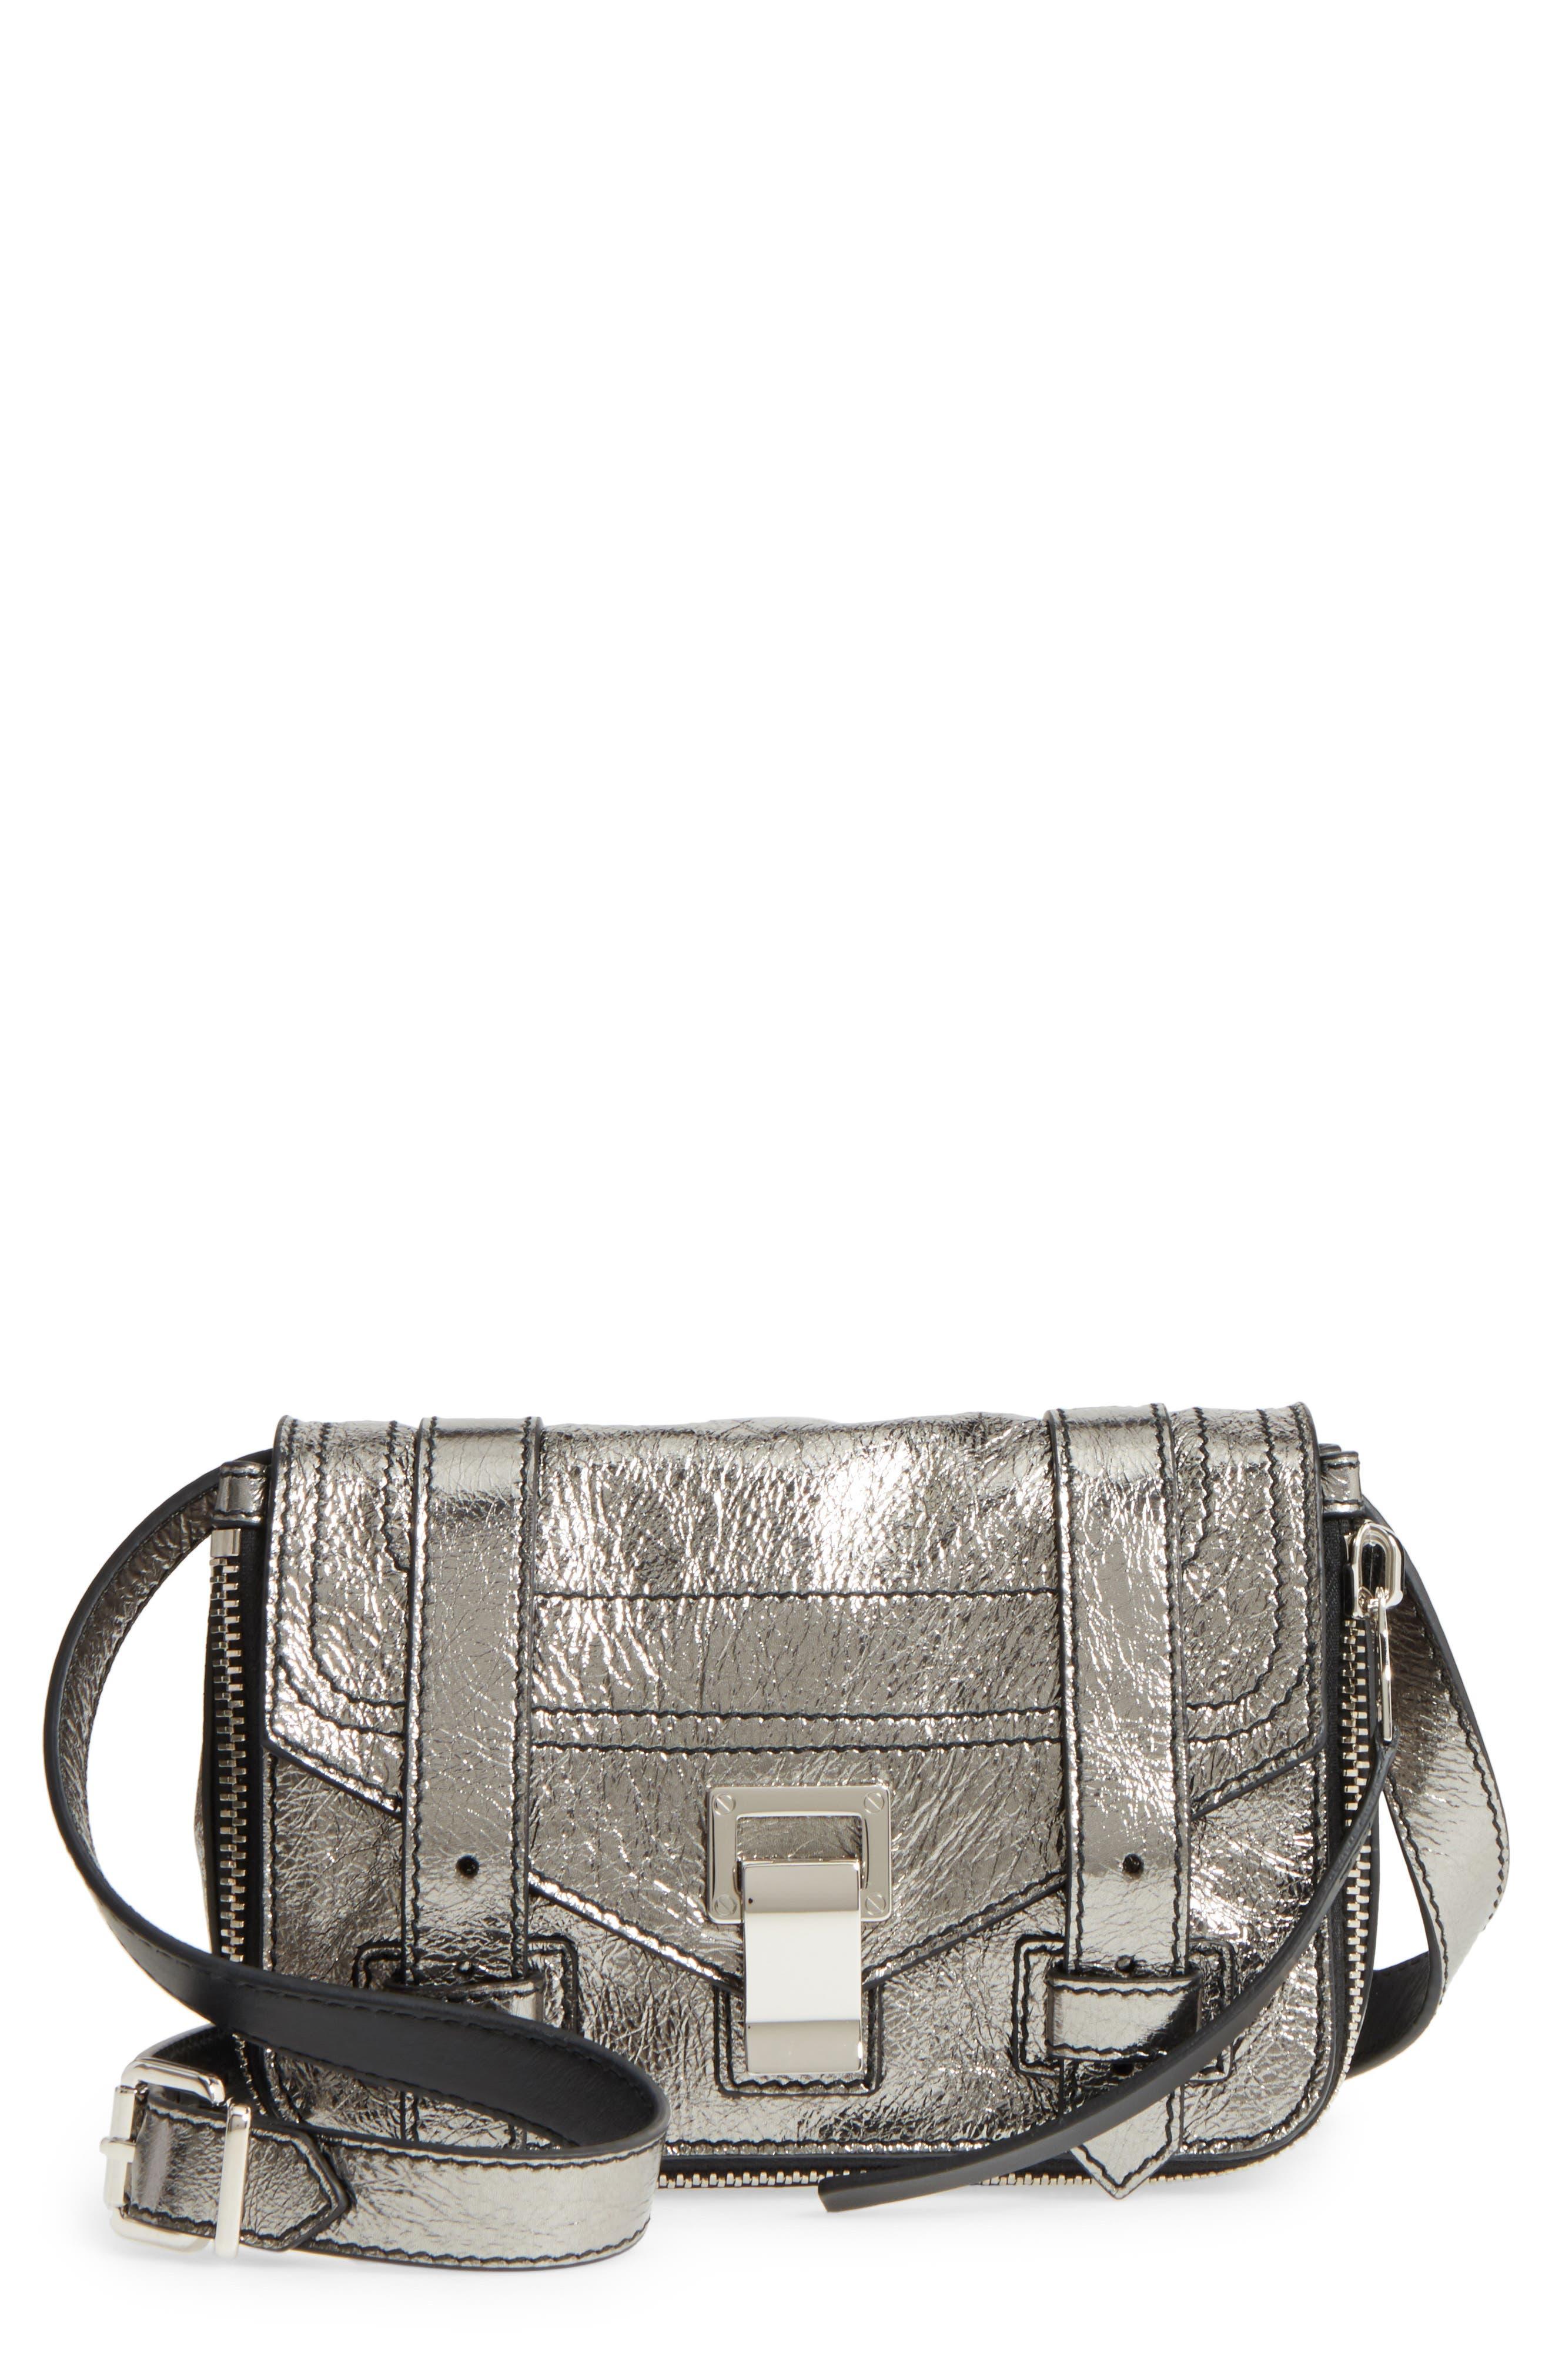 Mini PS1 Metallic Leather Crossbody Bag,                             Main thumbnail 1, color,                             040